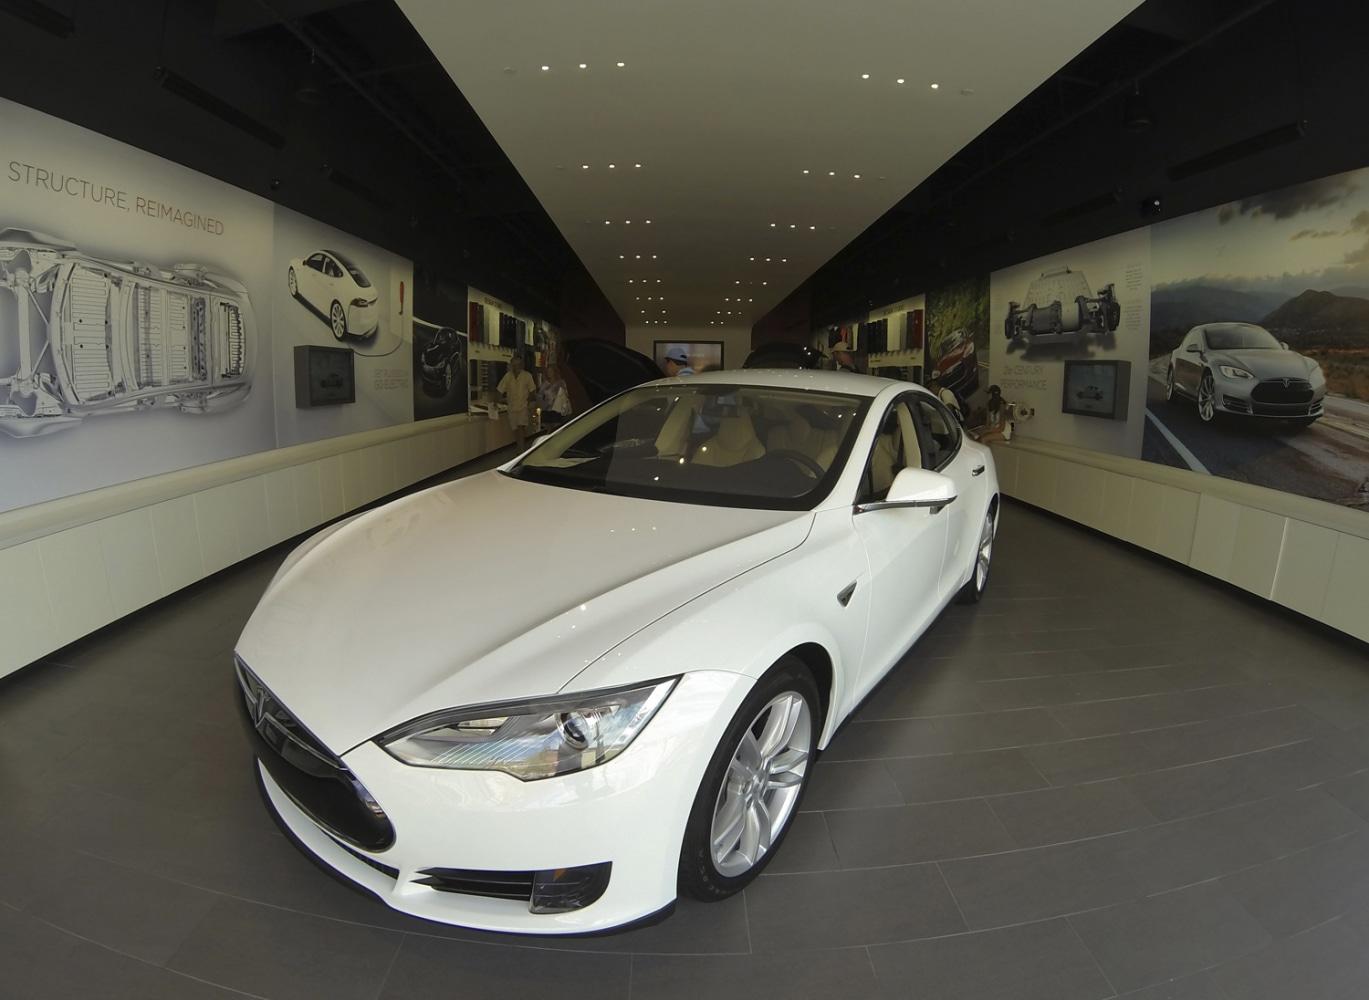 Electric Car Blaze Raises Questions For Tesla Nbc News